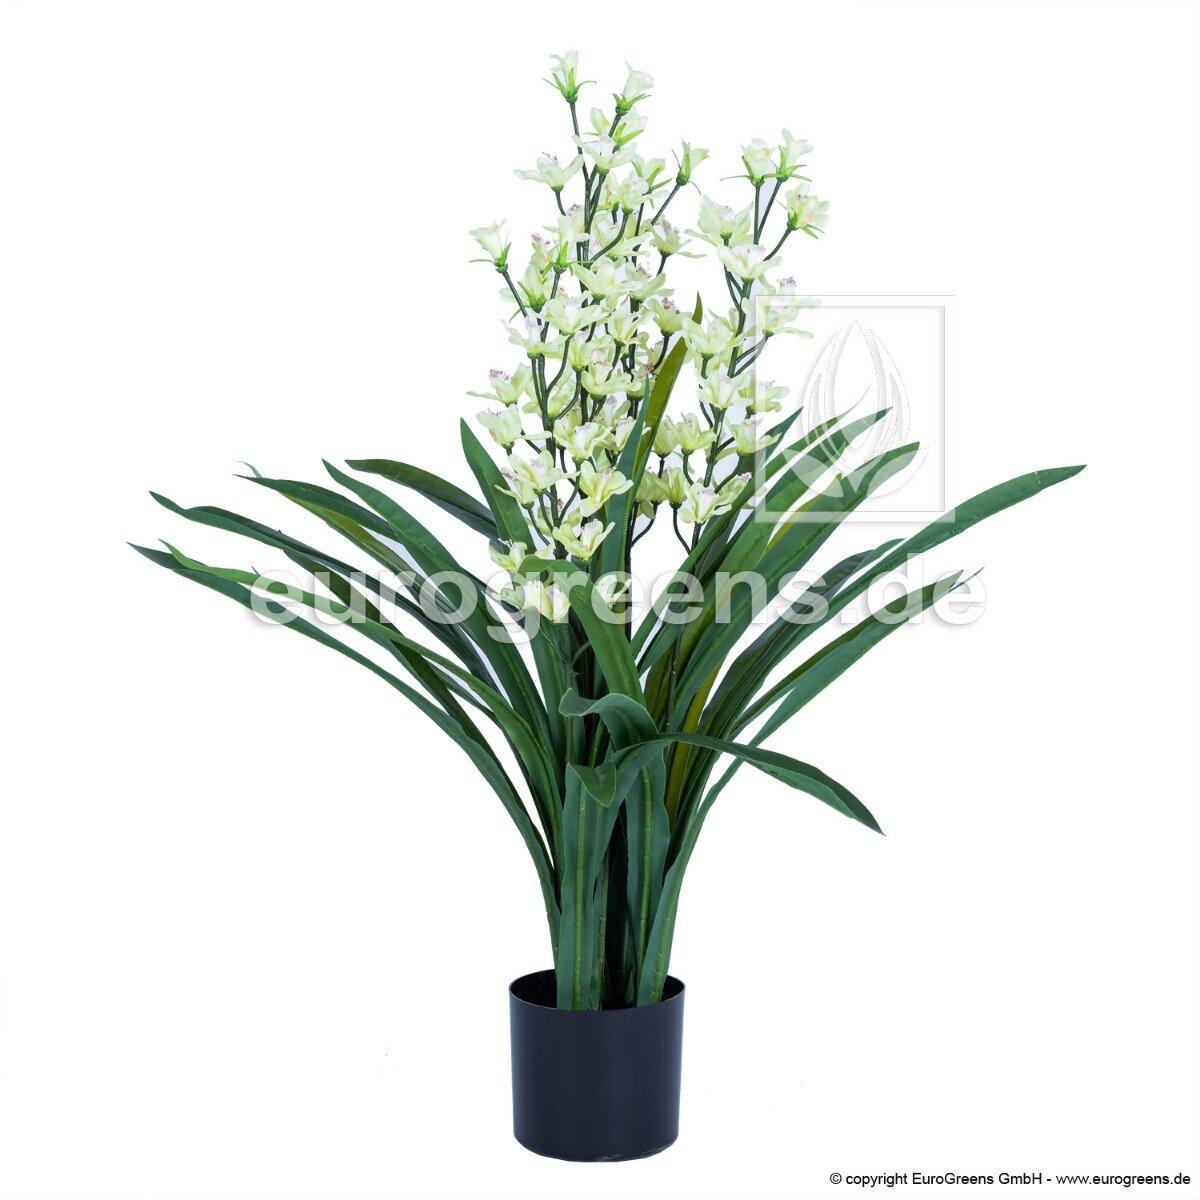 Umelá rastlina Orchidea Cymbidium biela 95 cm